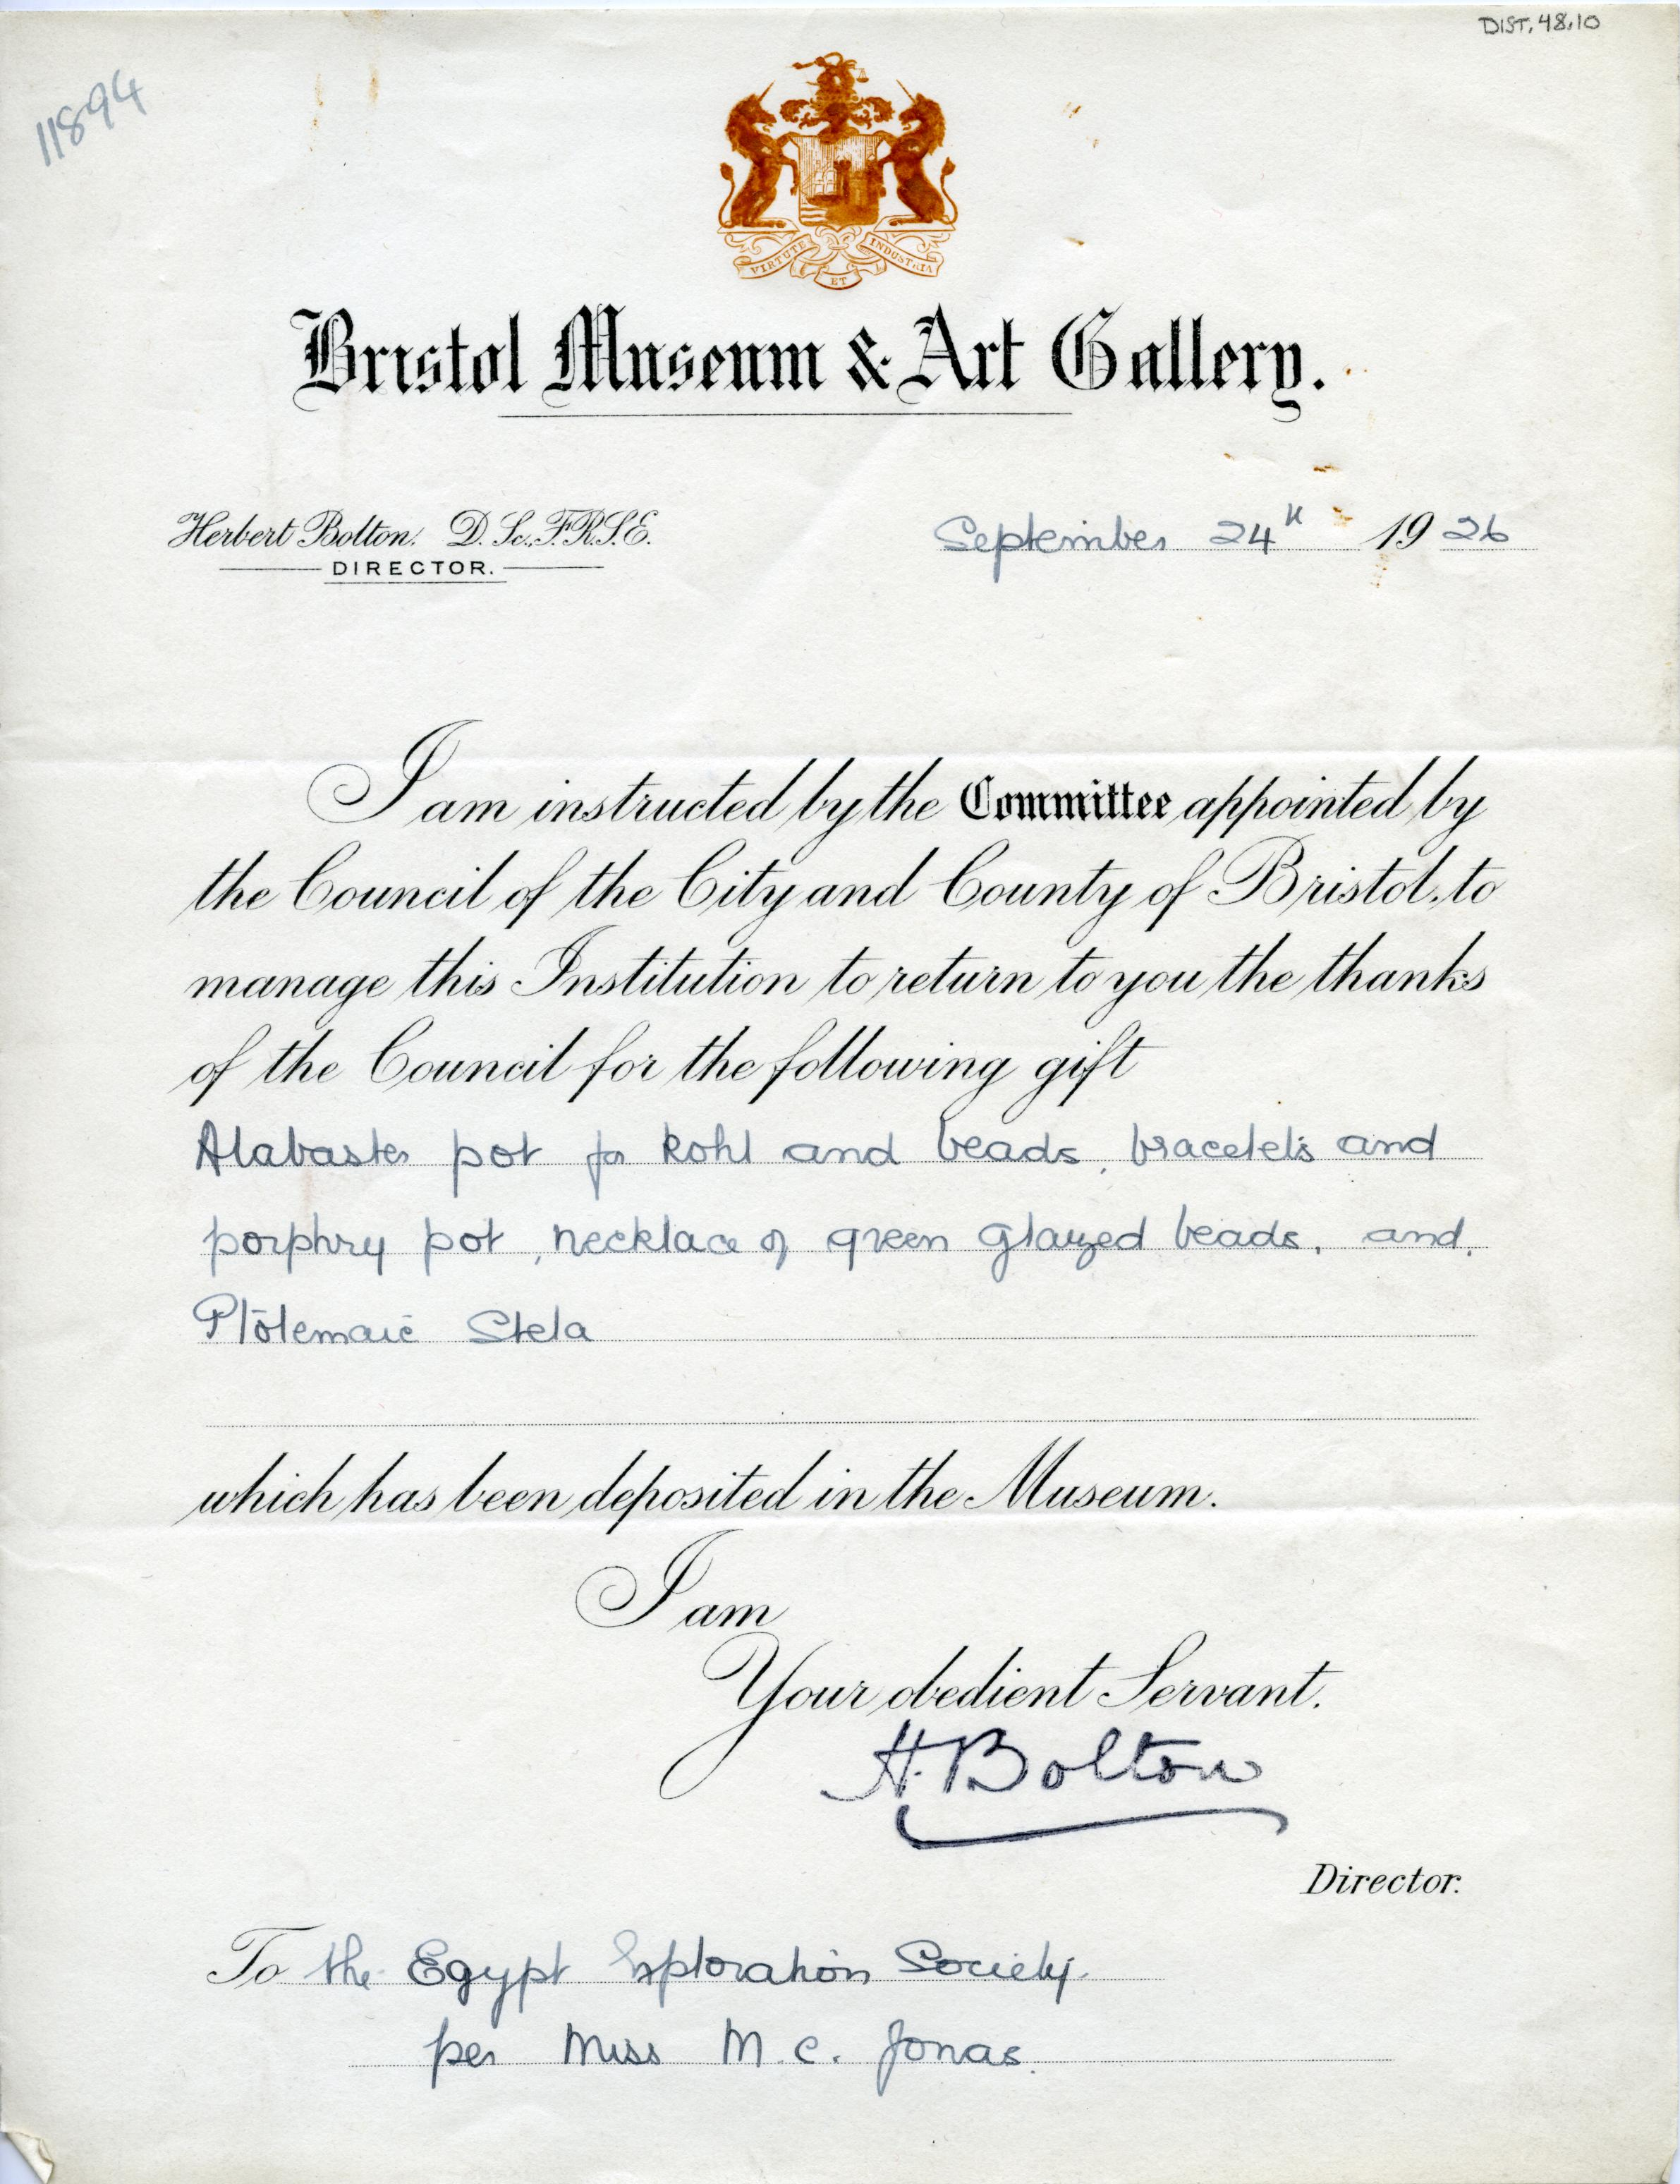 1925-26 Abydos DIST.48.10